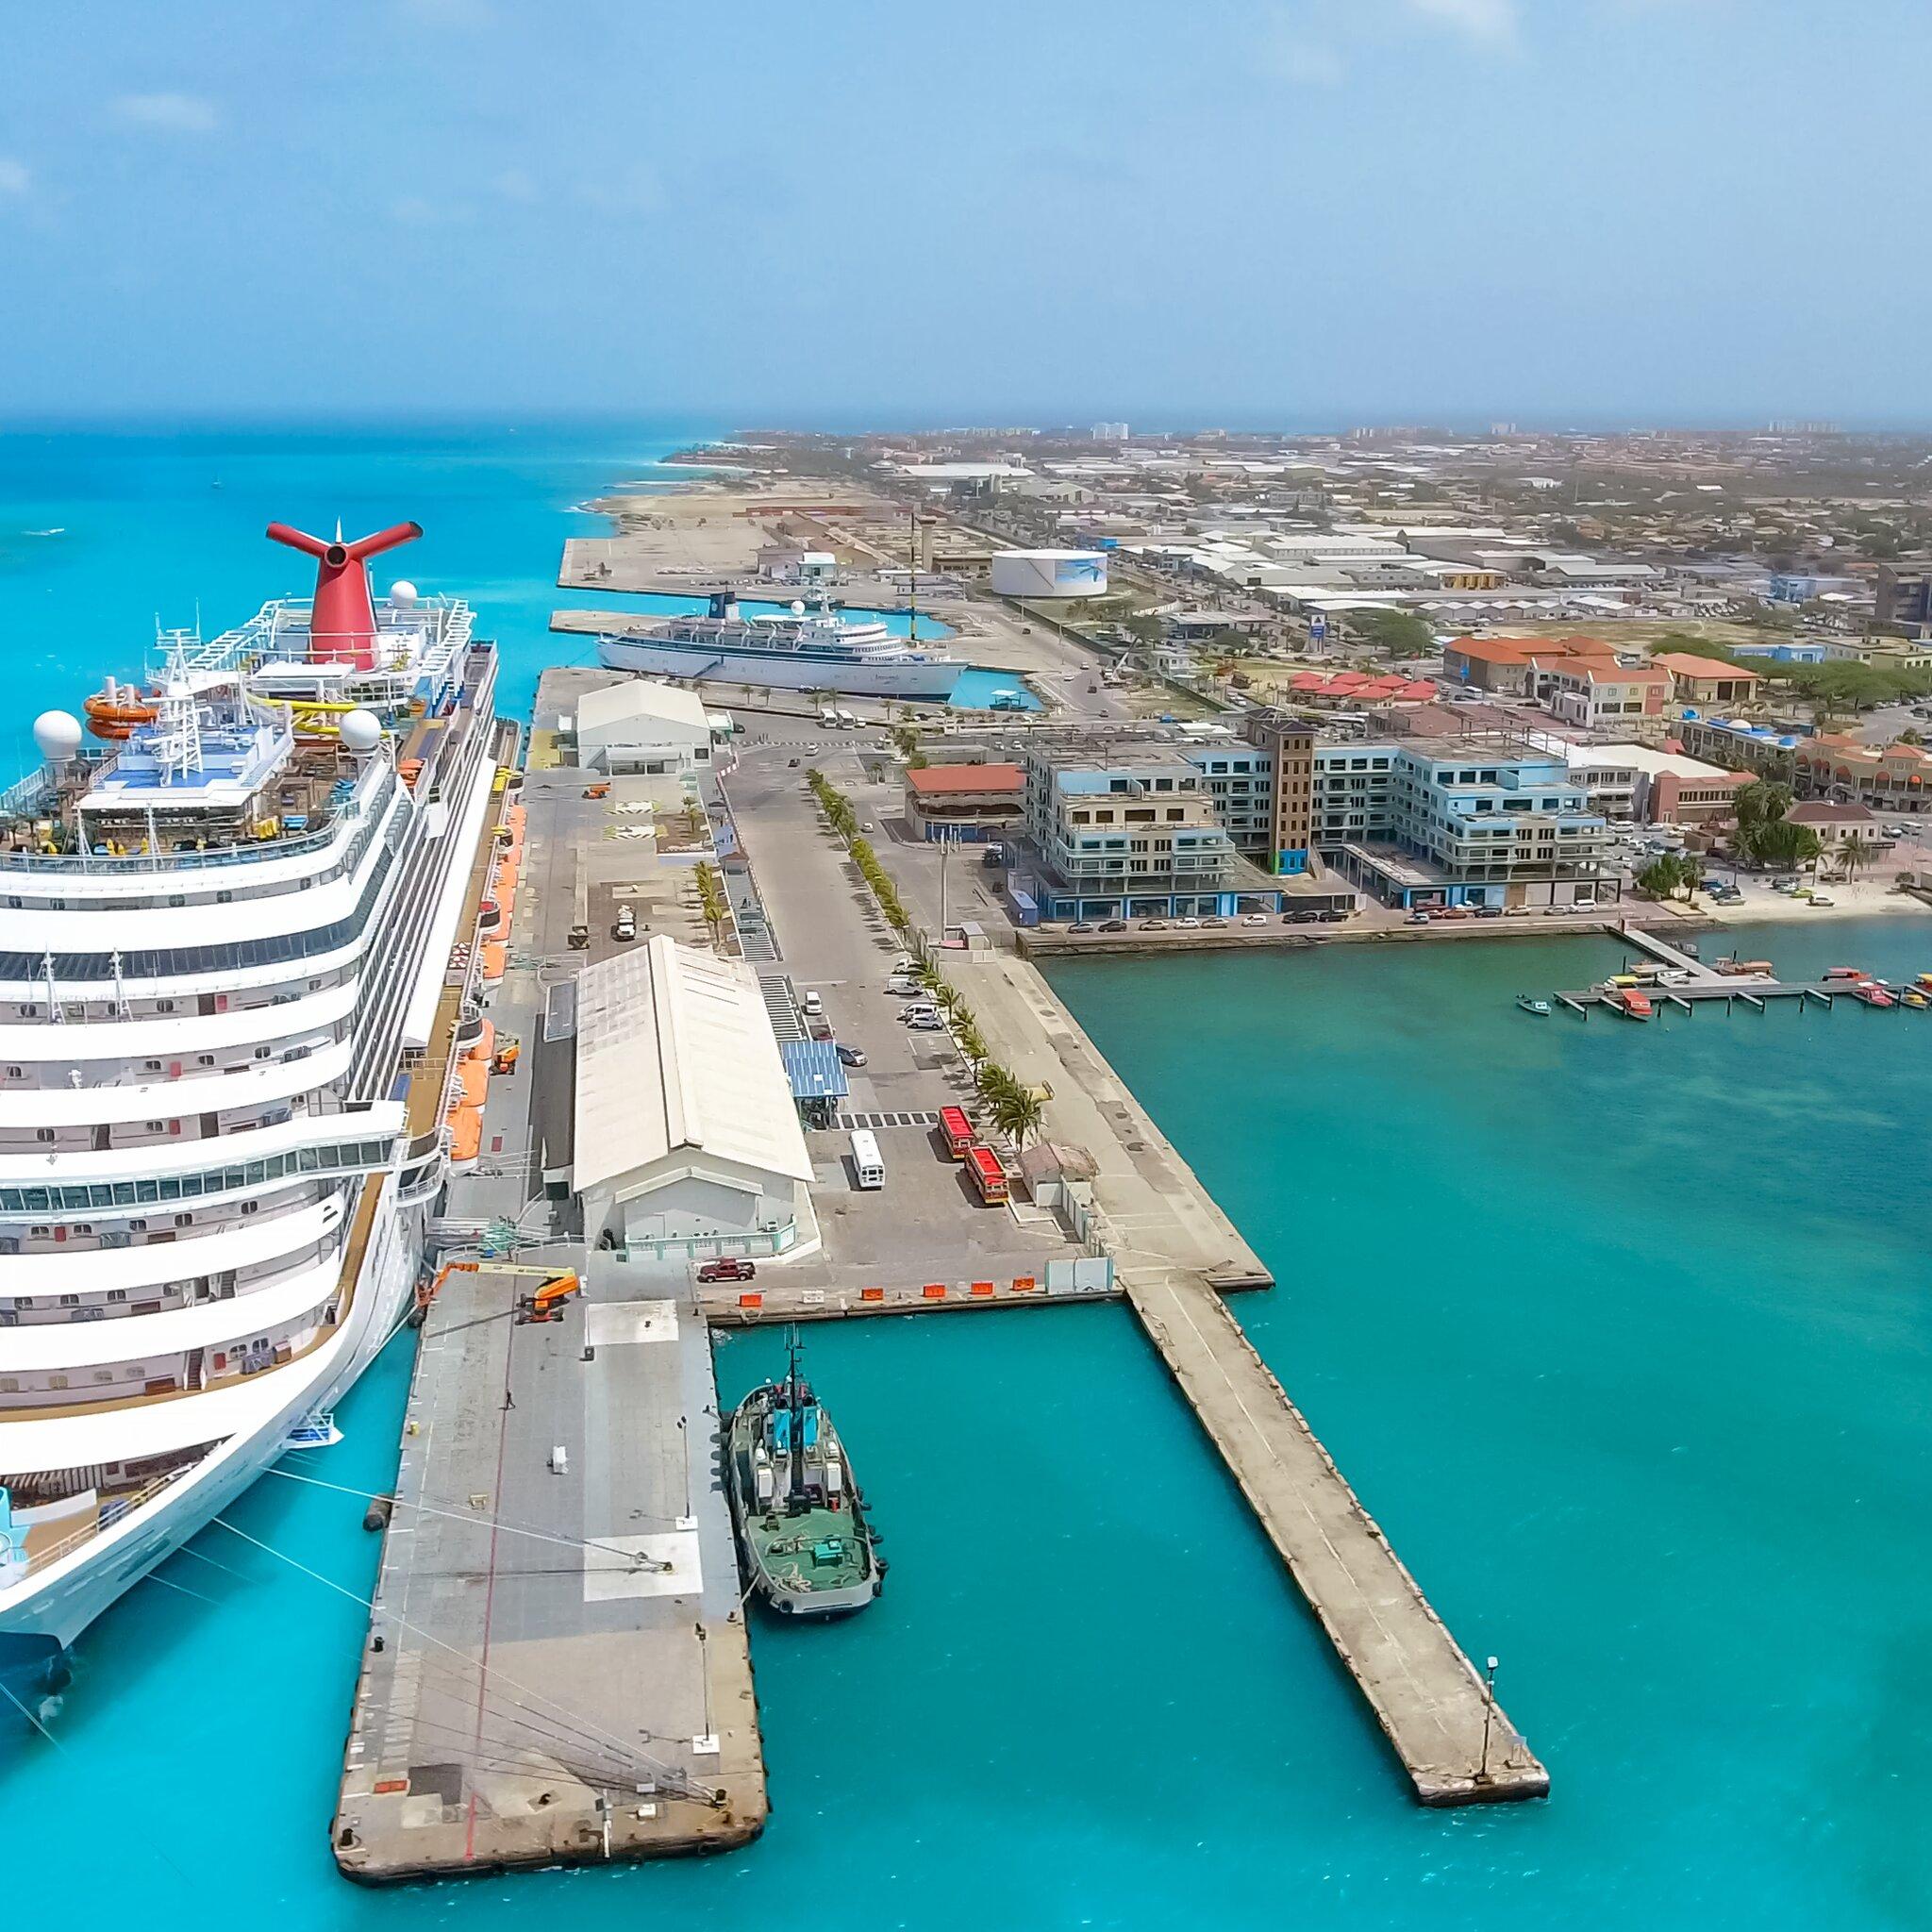 Cruises To Aruba >> 2019 Aruba Cruise Guide Best Cruise Lines To Aruba The